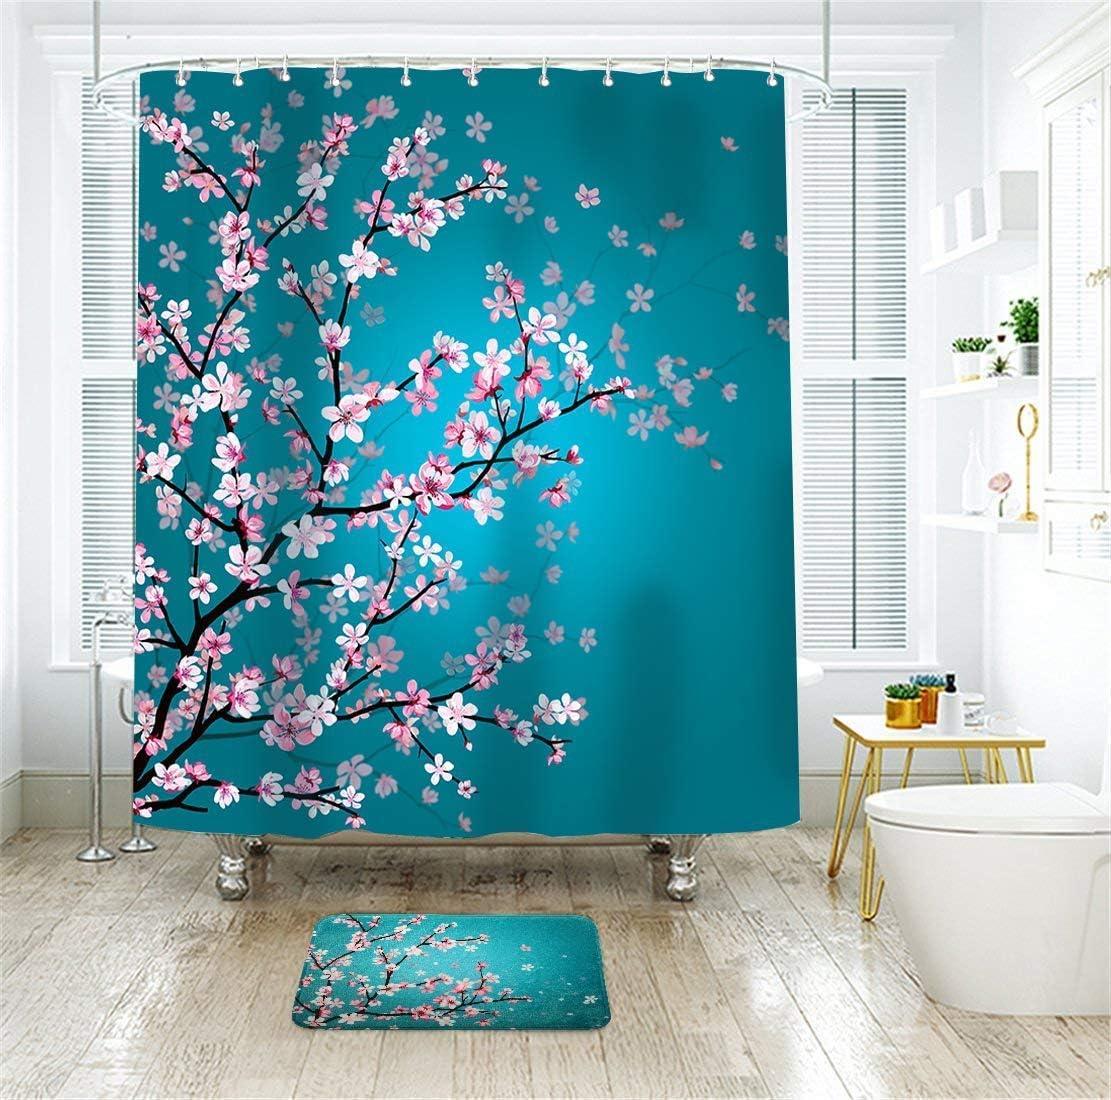 LIVILAN Teal Cherry Blossom Shower Curtain and Rug Set for Bathroom with 12 Hooks Bath Curtain with Bath Mat Fabric